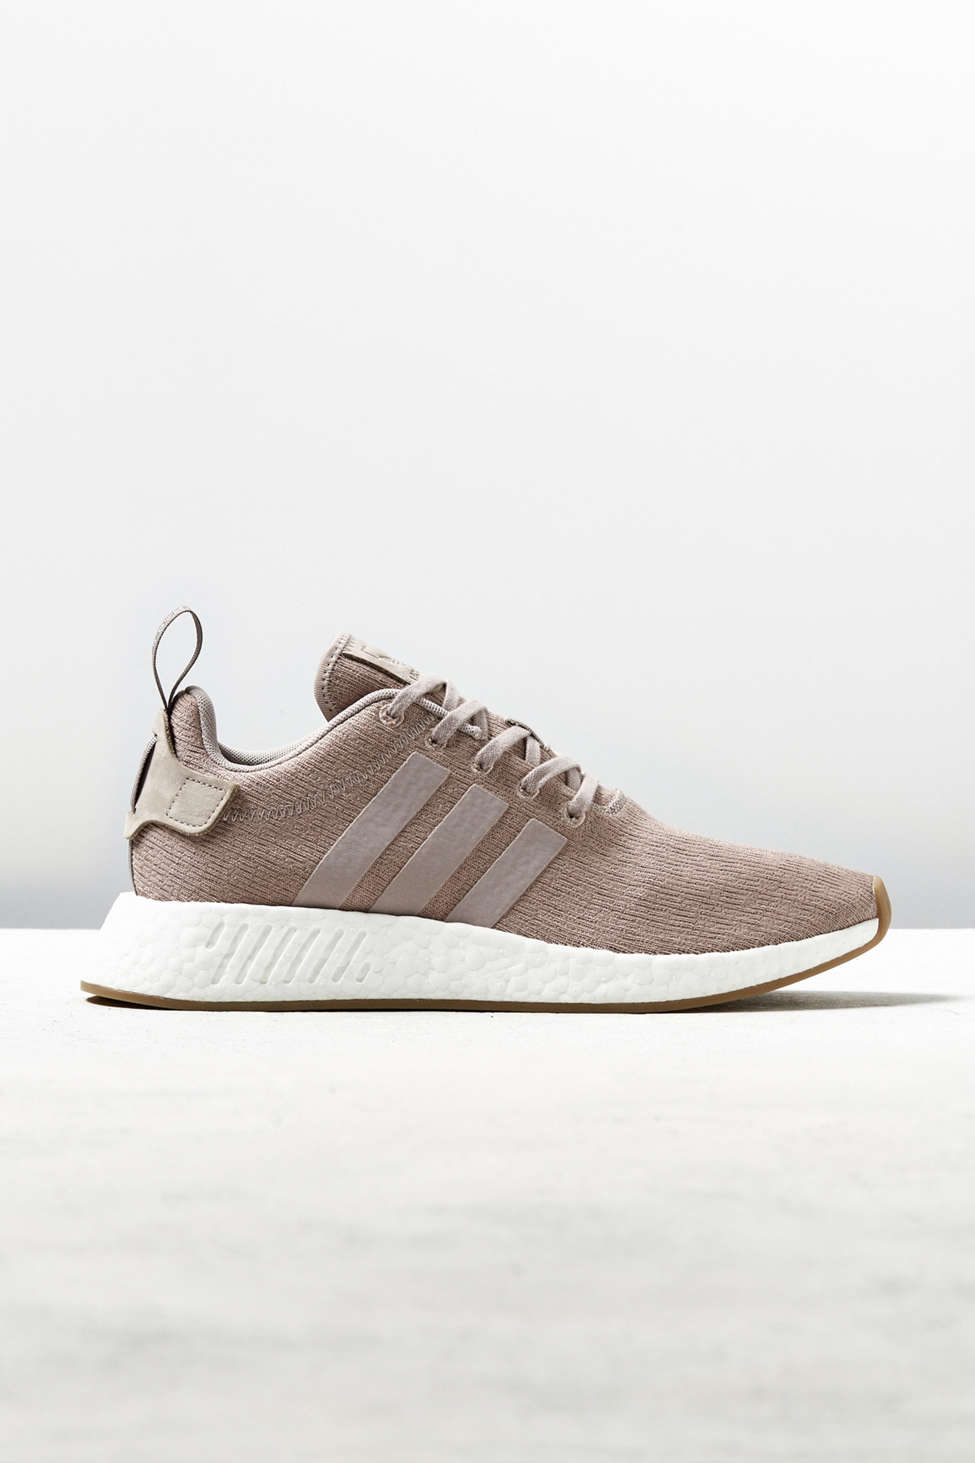 scarpe adidas nmd r2 urban outfitters canada